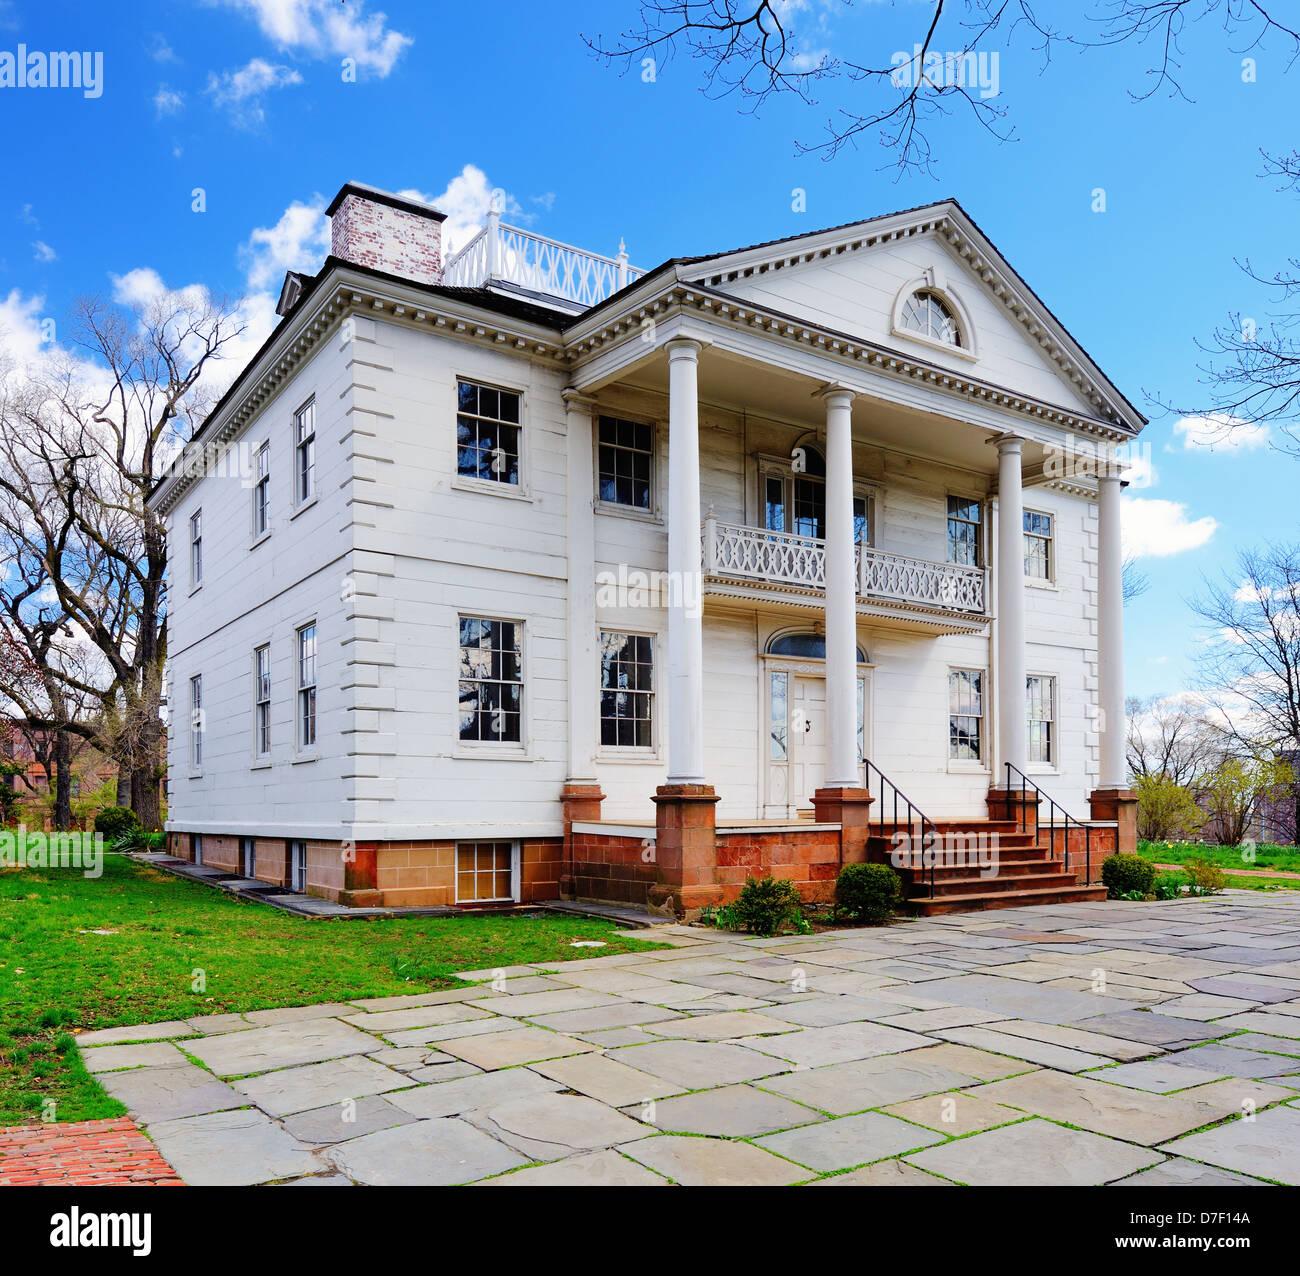 The historic Morris-Jumel Mansion in Washington Heights, New York, New York, USA. - Stock Image